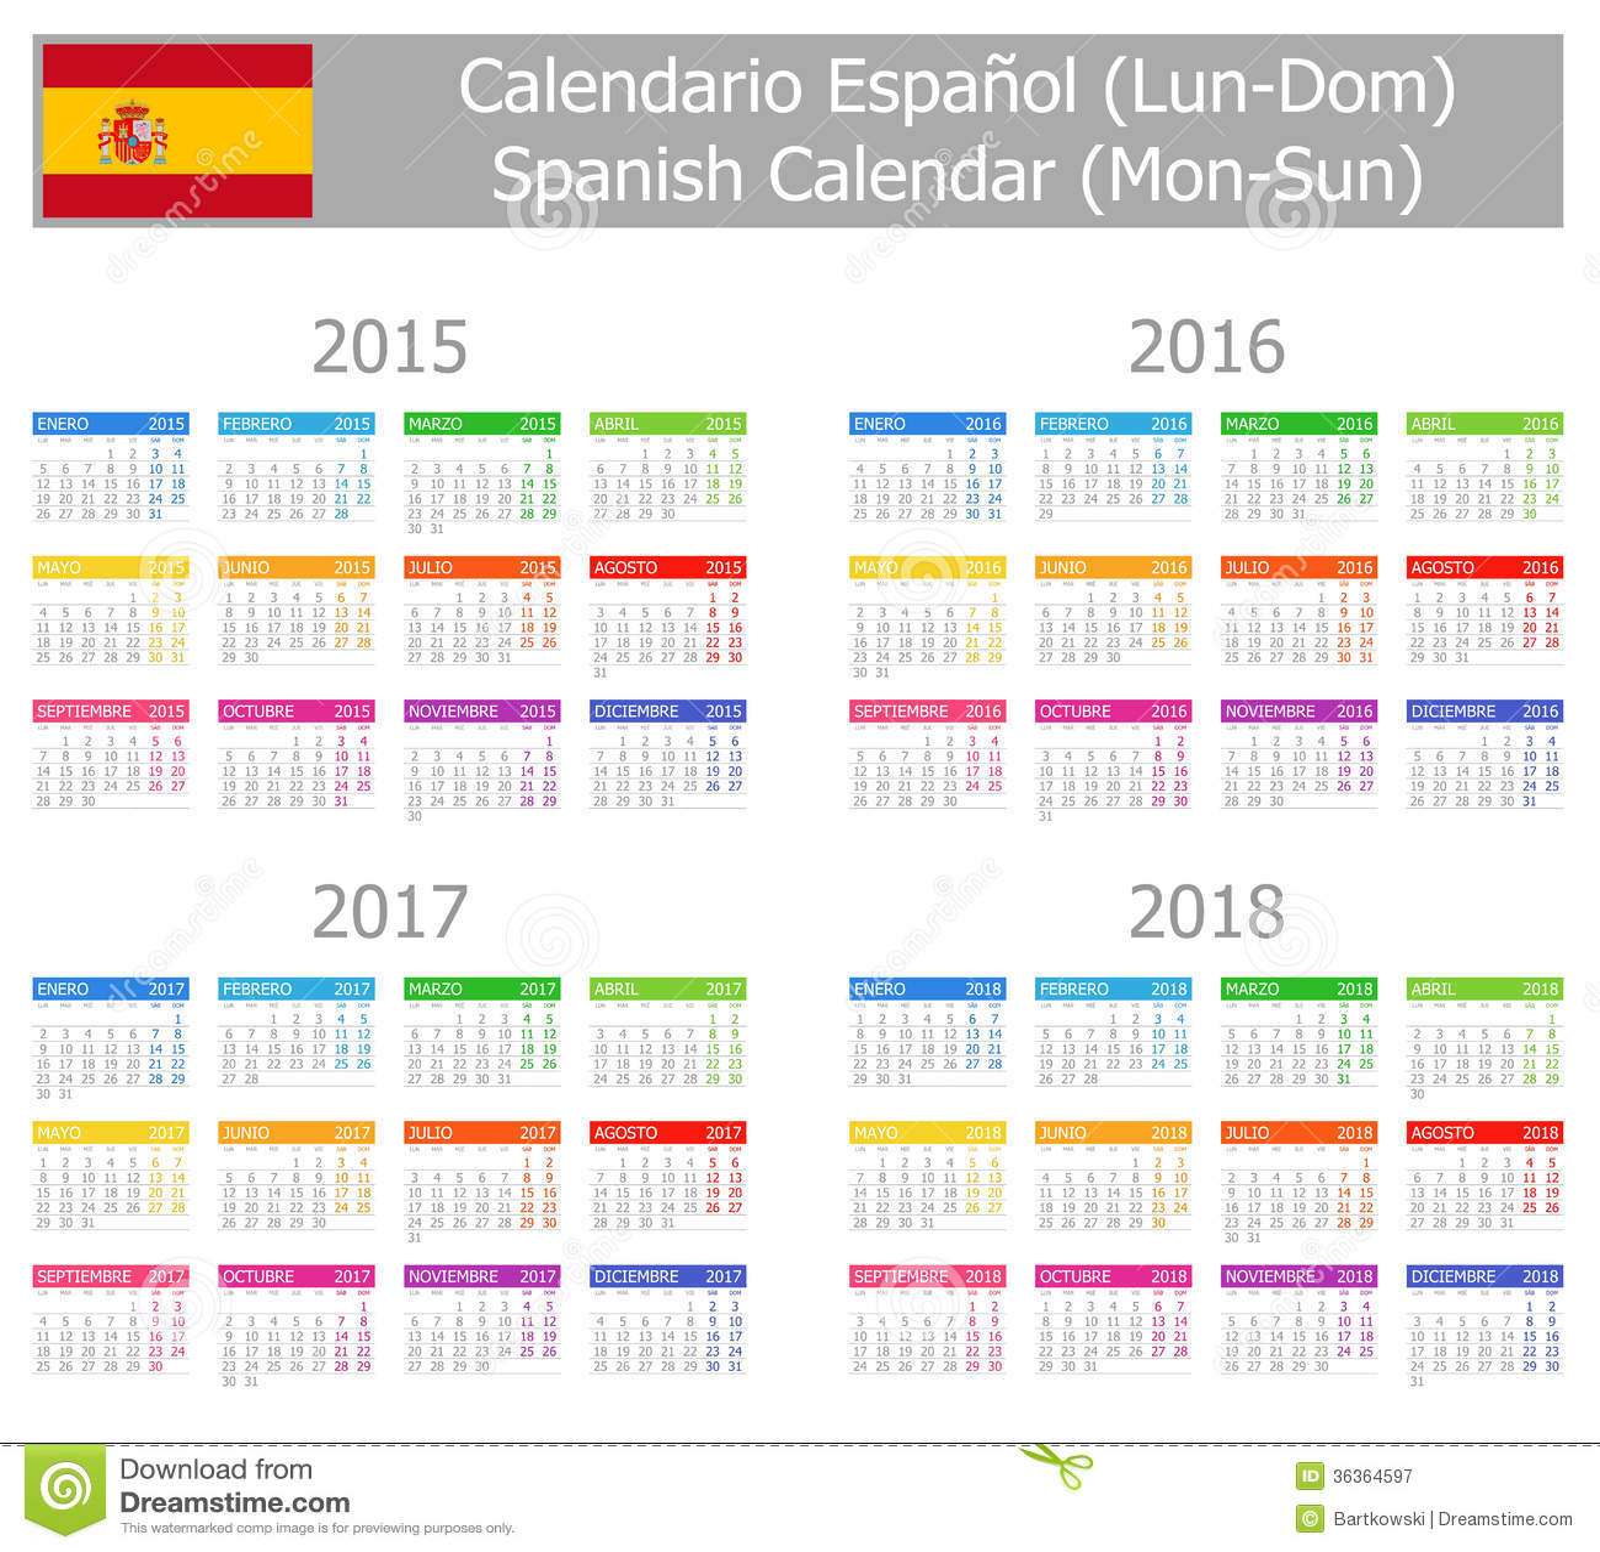 Httpearthcalendarphpcountrysearchphp Calendario Espa241;ol 2015 2018 Del Tipo 1 Lunes Sun